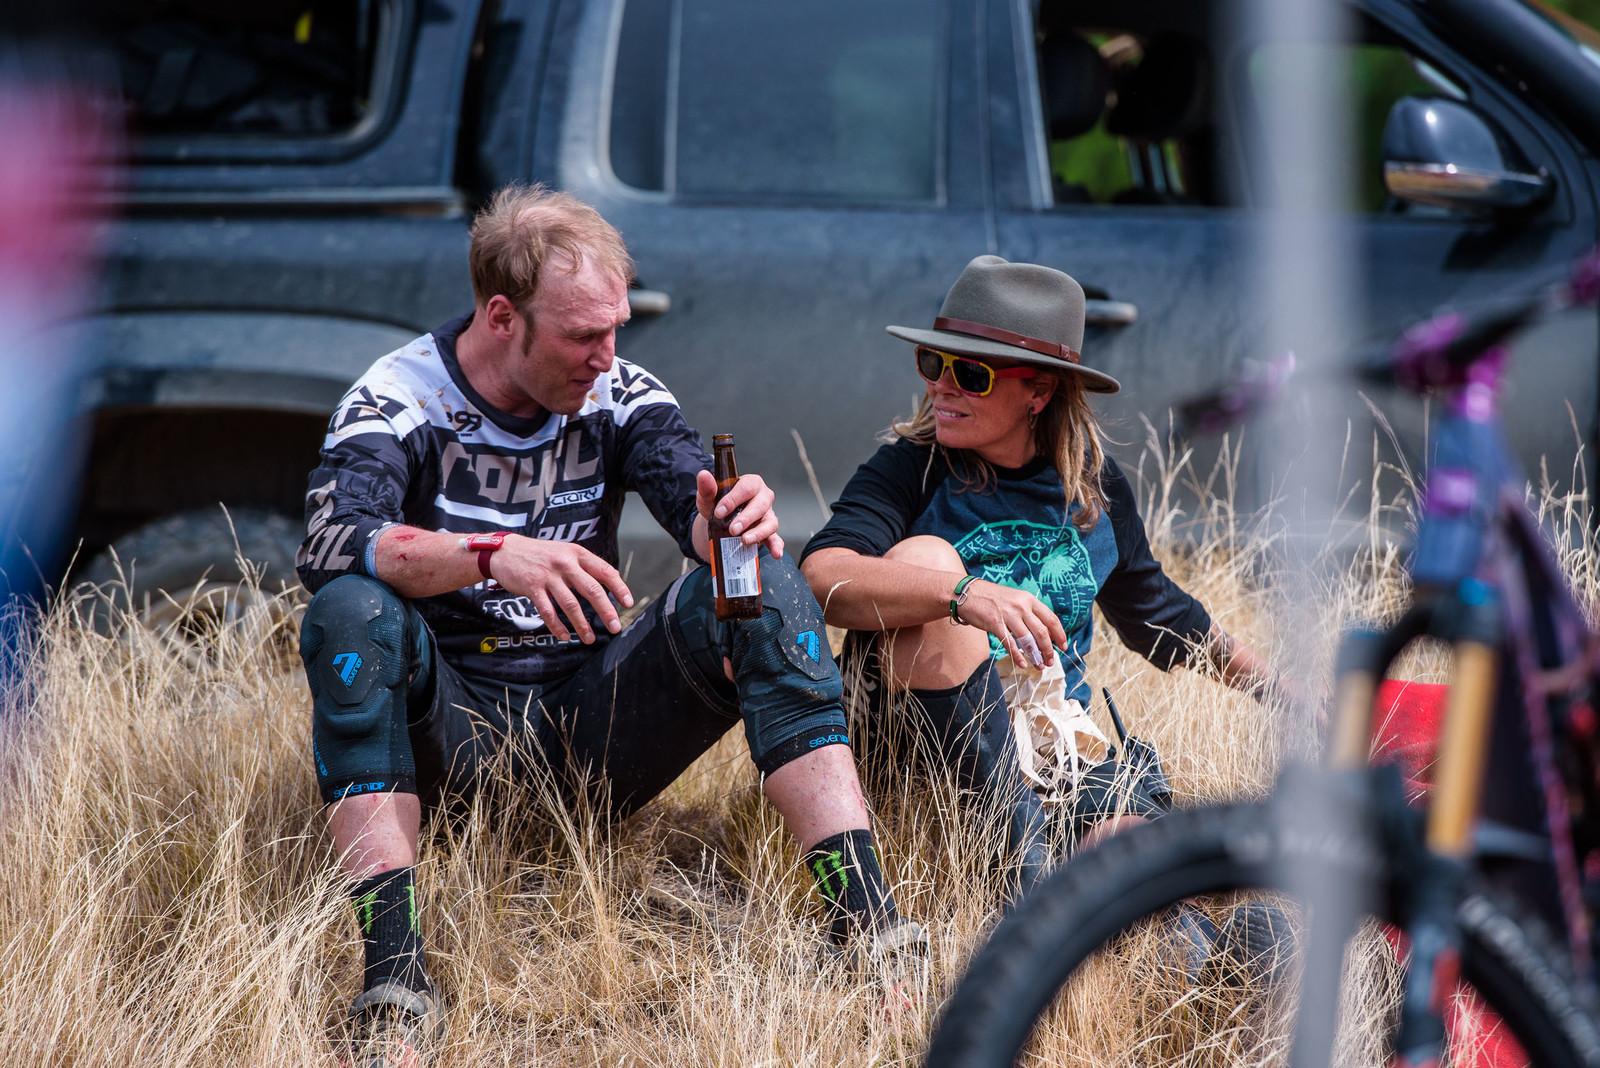 NZenduro19 day 3 DShaw-8781 - 2019 NZ Enduro Day 3 Photo Gallery - Mountain Biking Pictures - Vital MTB